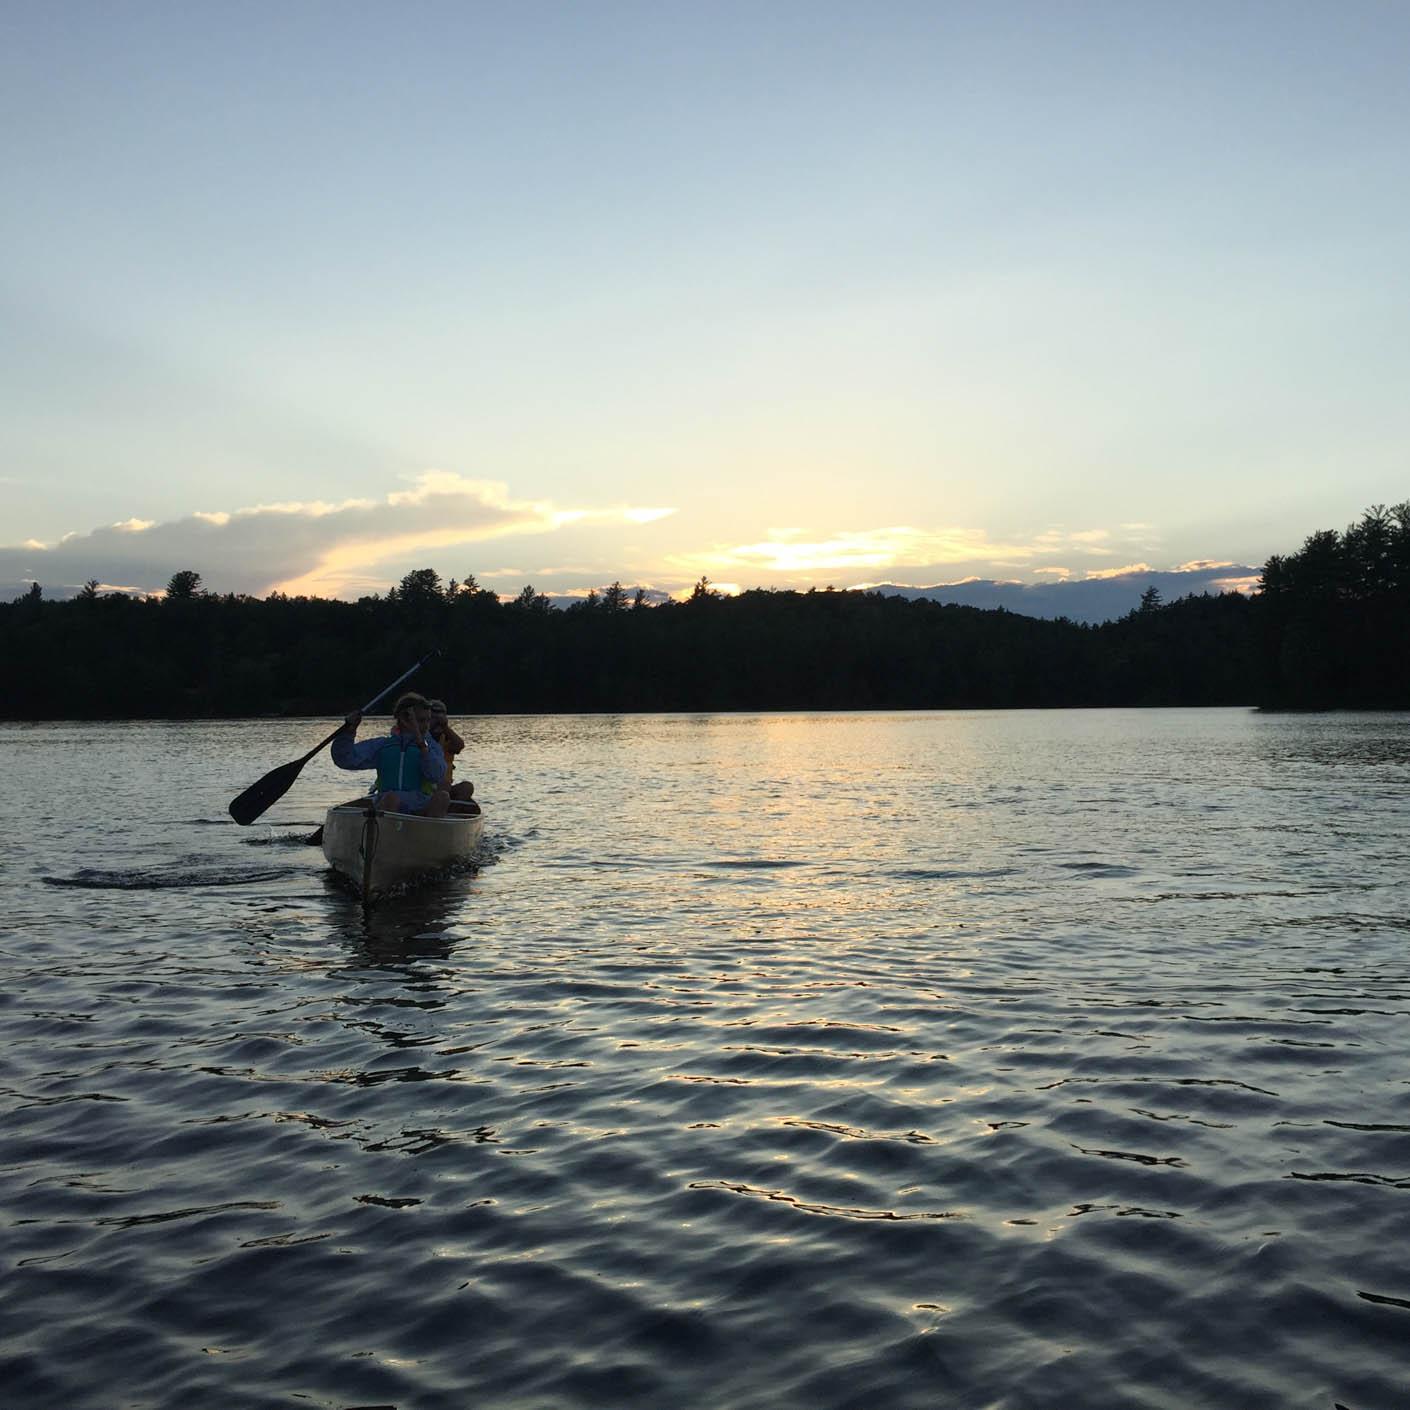 Adirondack Discovery canoeing